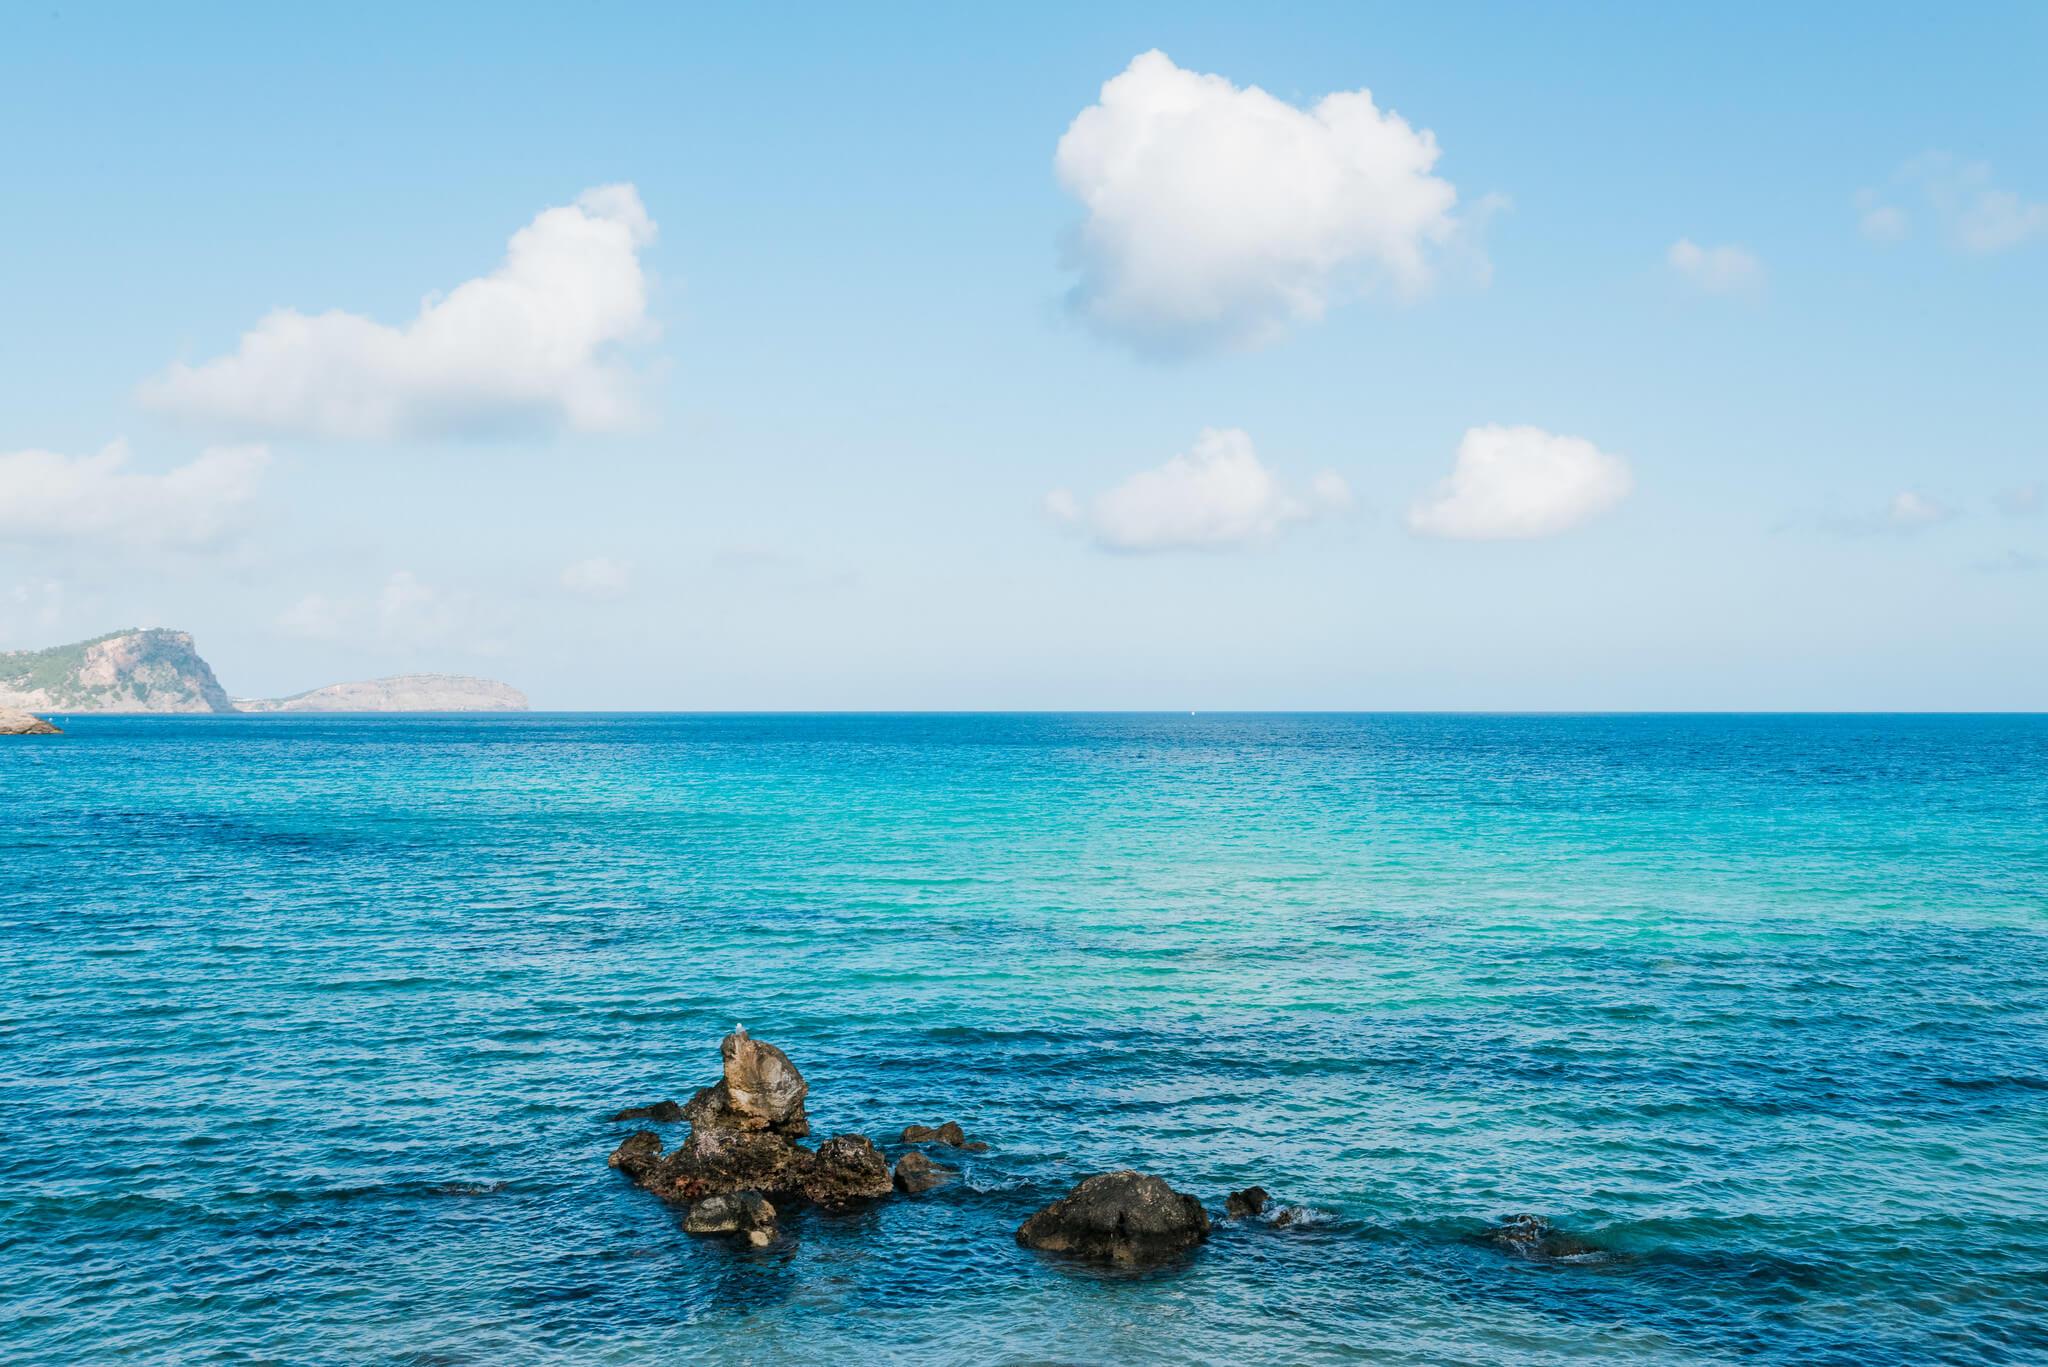 https://www.white-ibiza.com/wp-content/uploads/2020/03/ibiza-beaches-cala-nova-02.jpg